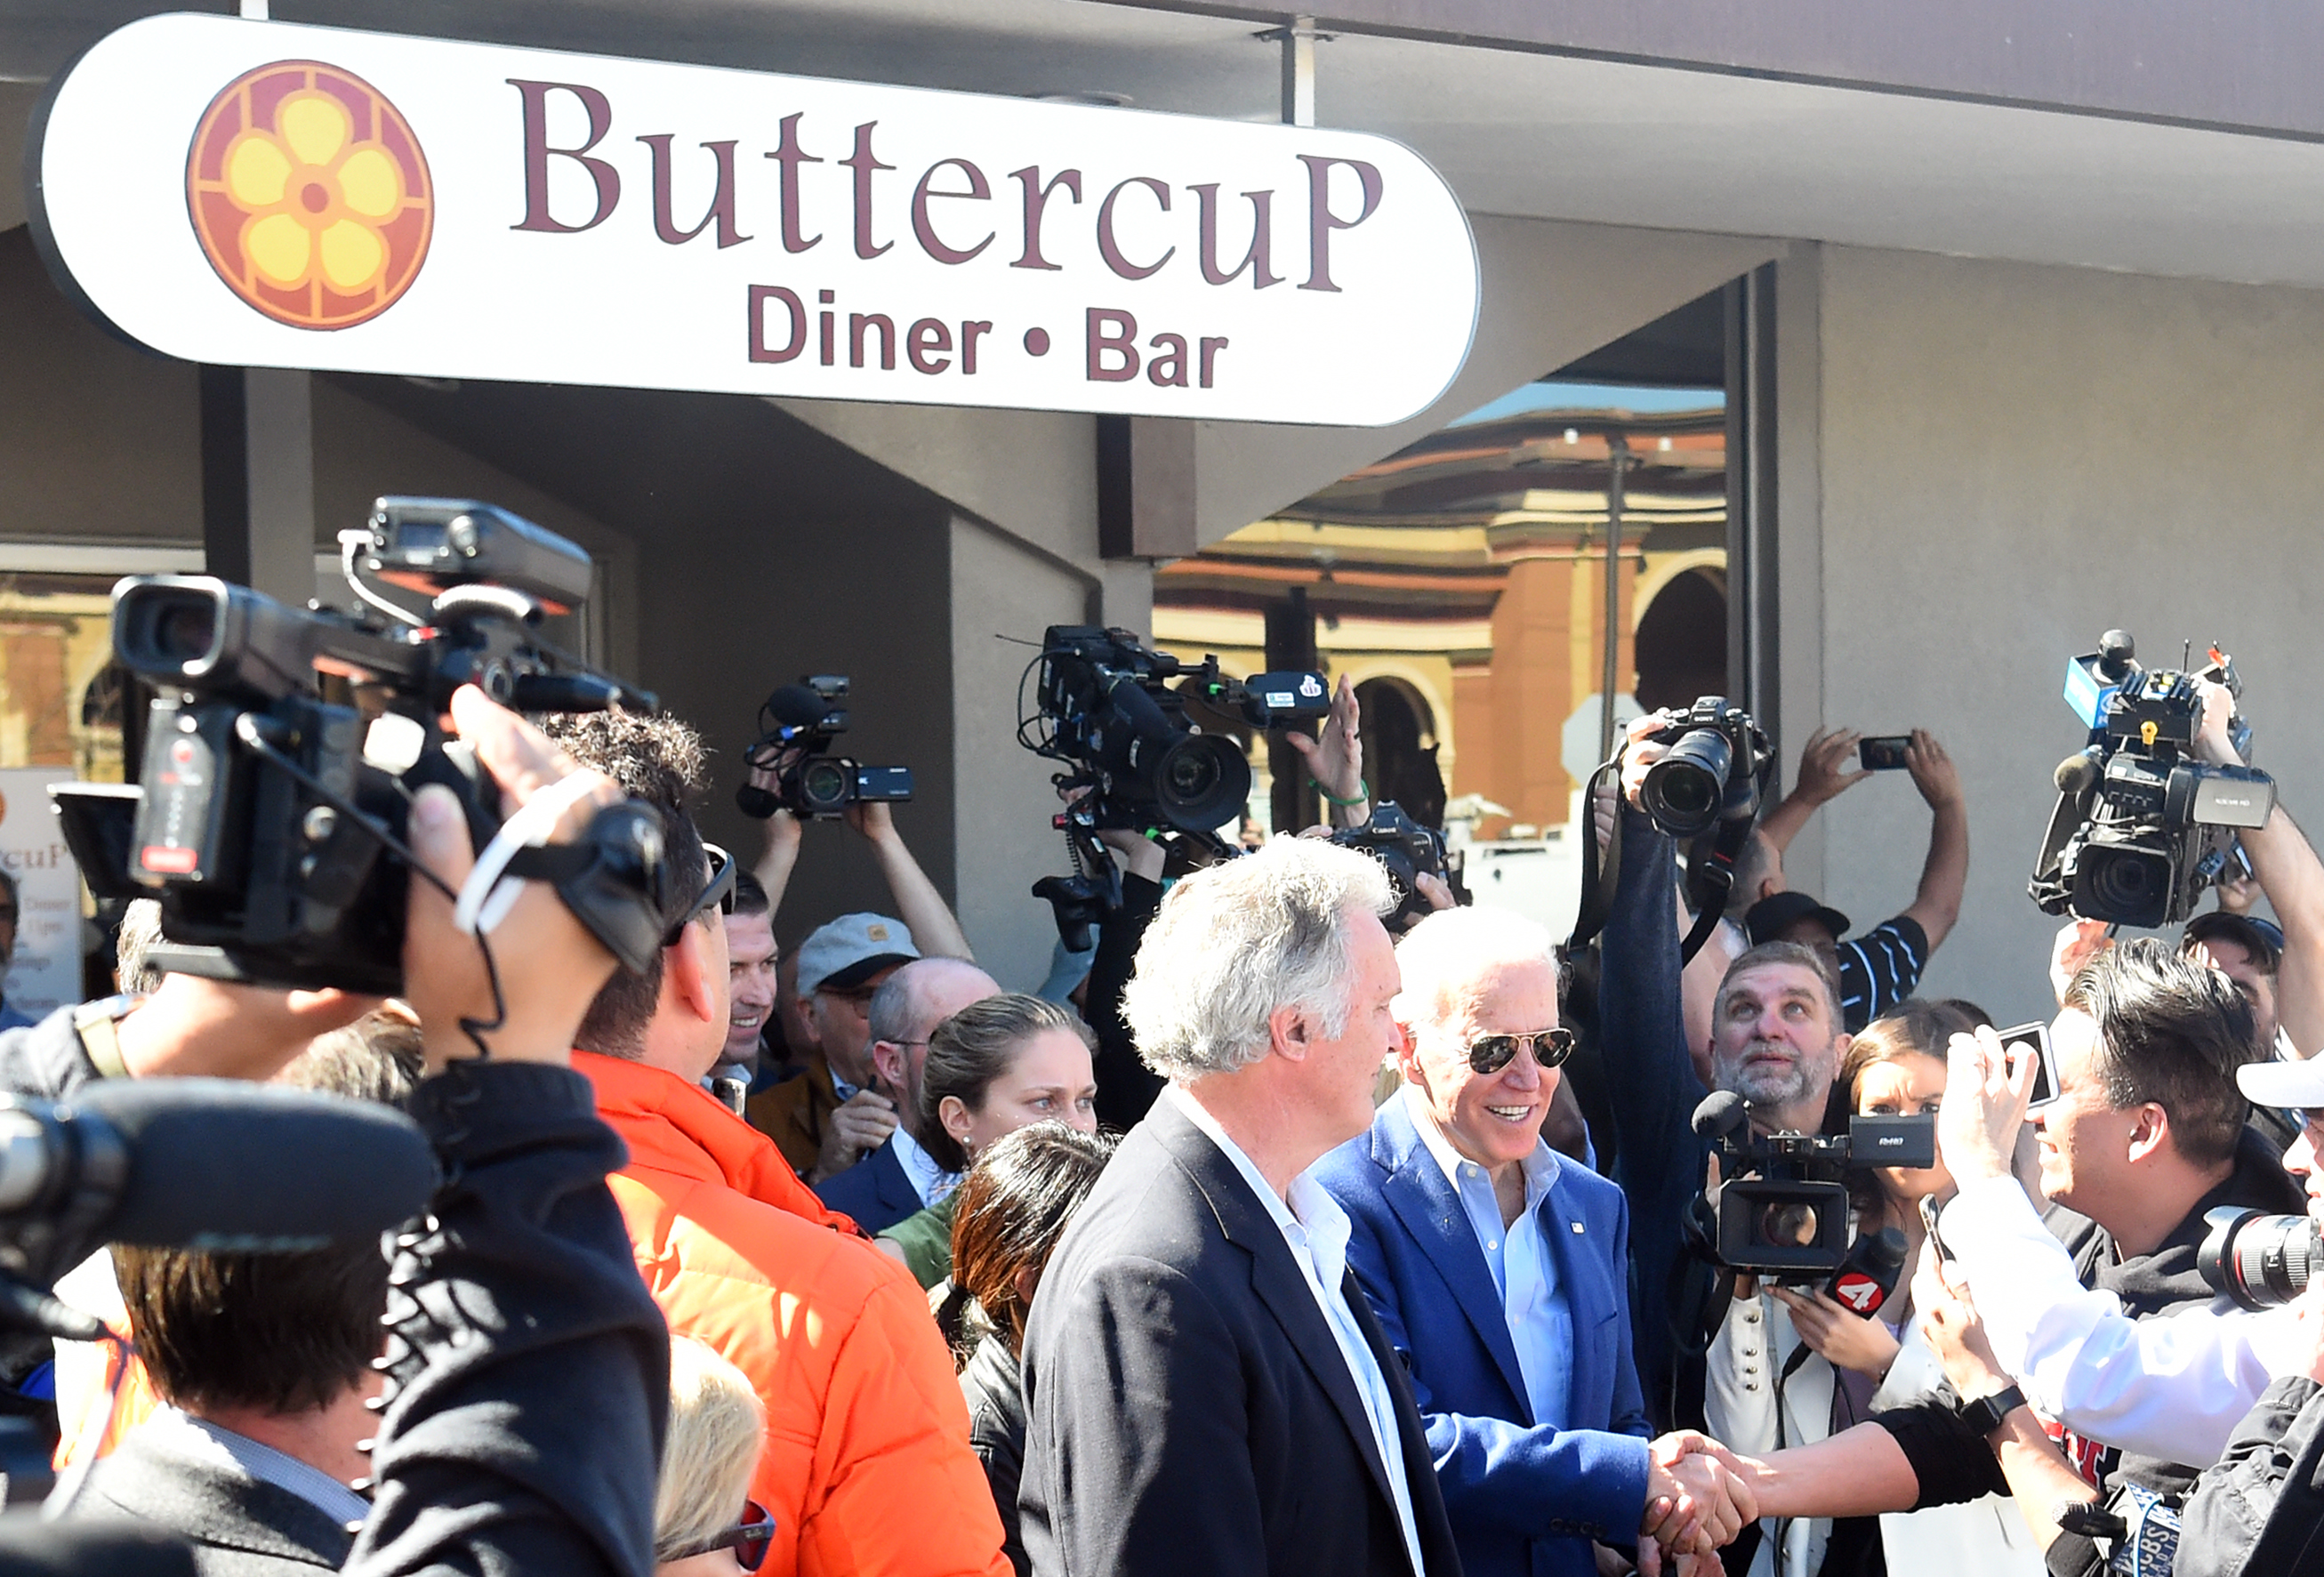 Democratic presidential candidate Joe Biden greets members of the media at Buttercup Diner in Oakland, California.